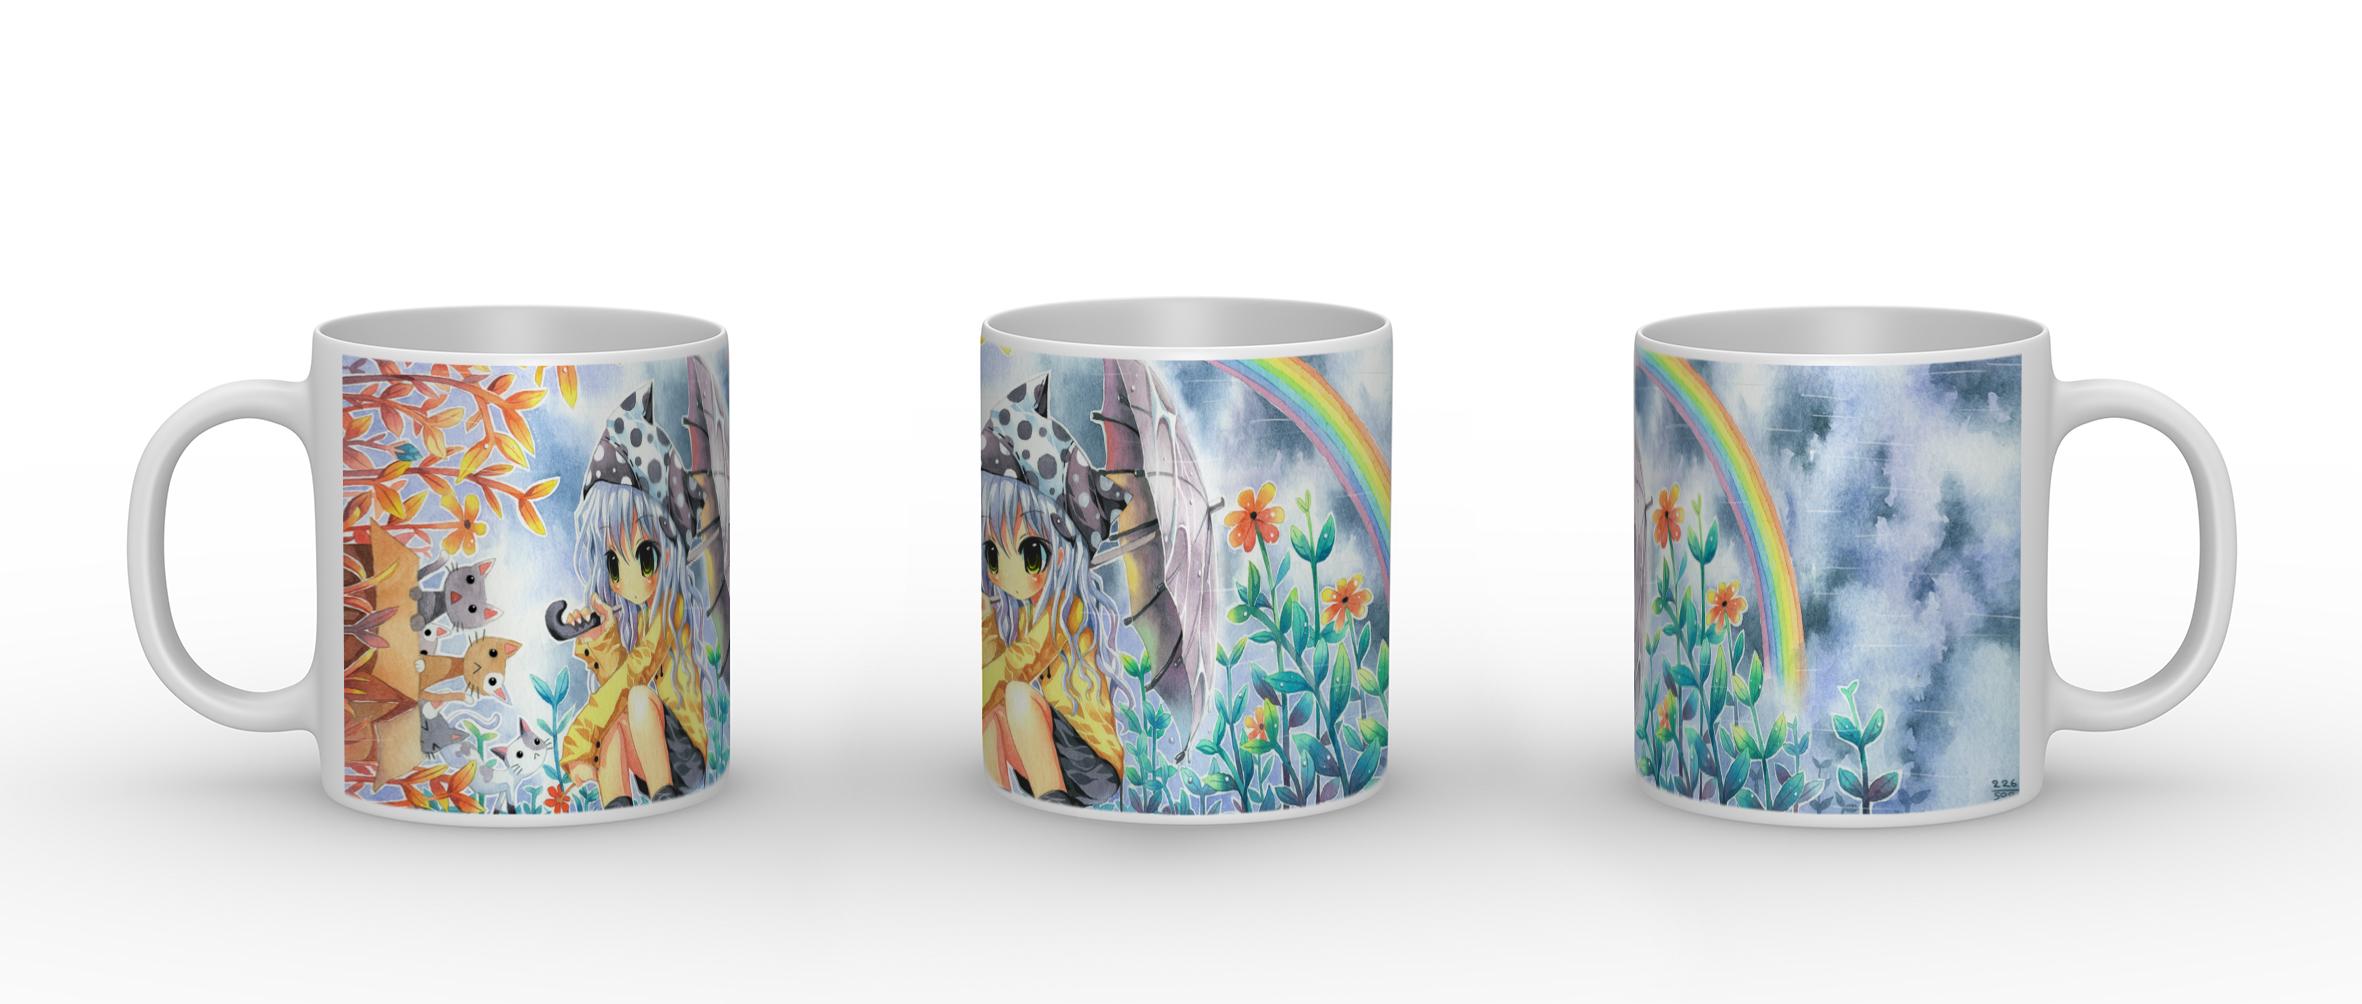 Rainbow Girl - Keramik Tasse mit Panorama Motiv